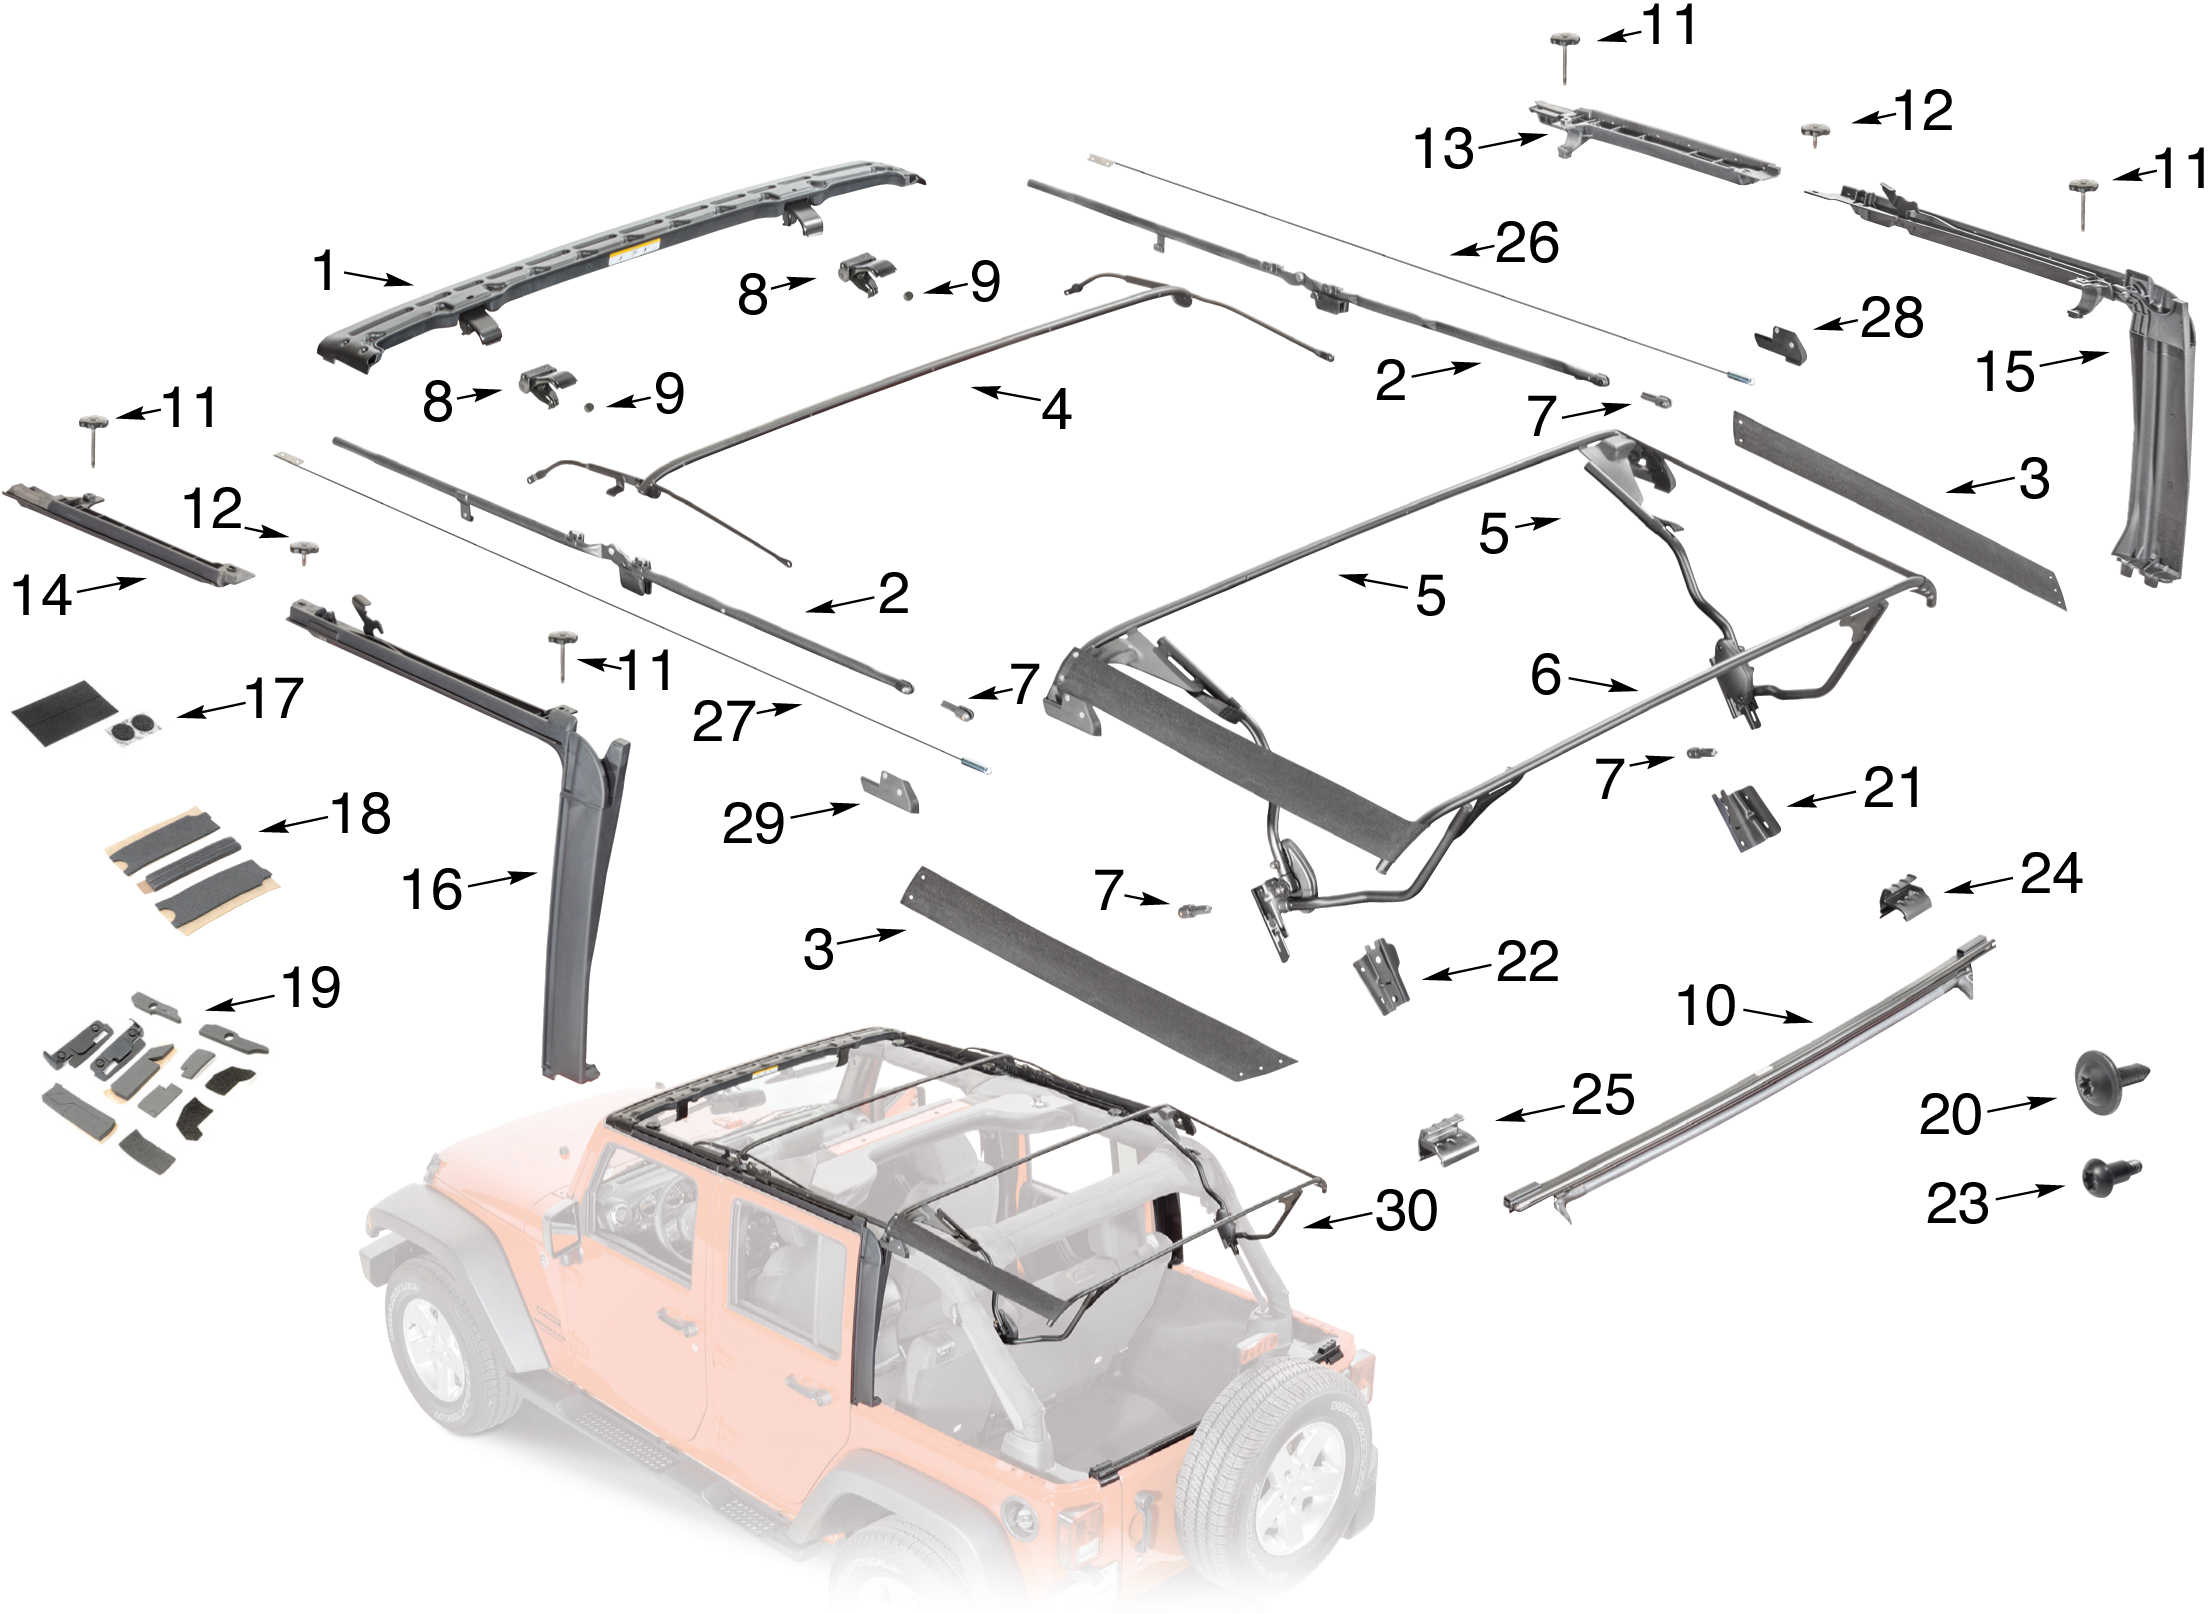 small resolution of jk top diagram all kind of wiring diagrams u2022 access wiring diagram bestop wiring diagram